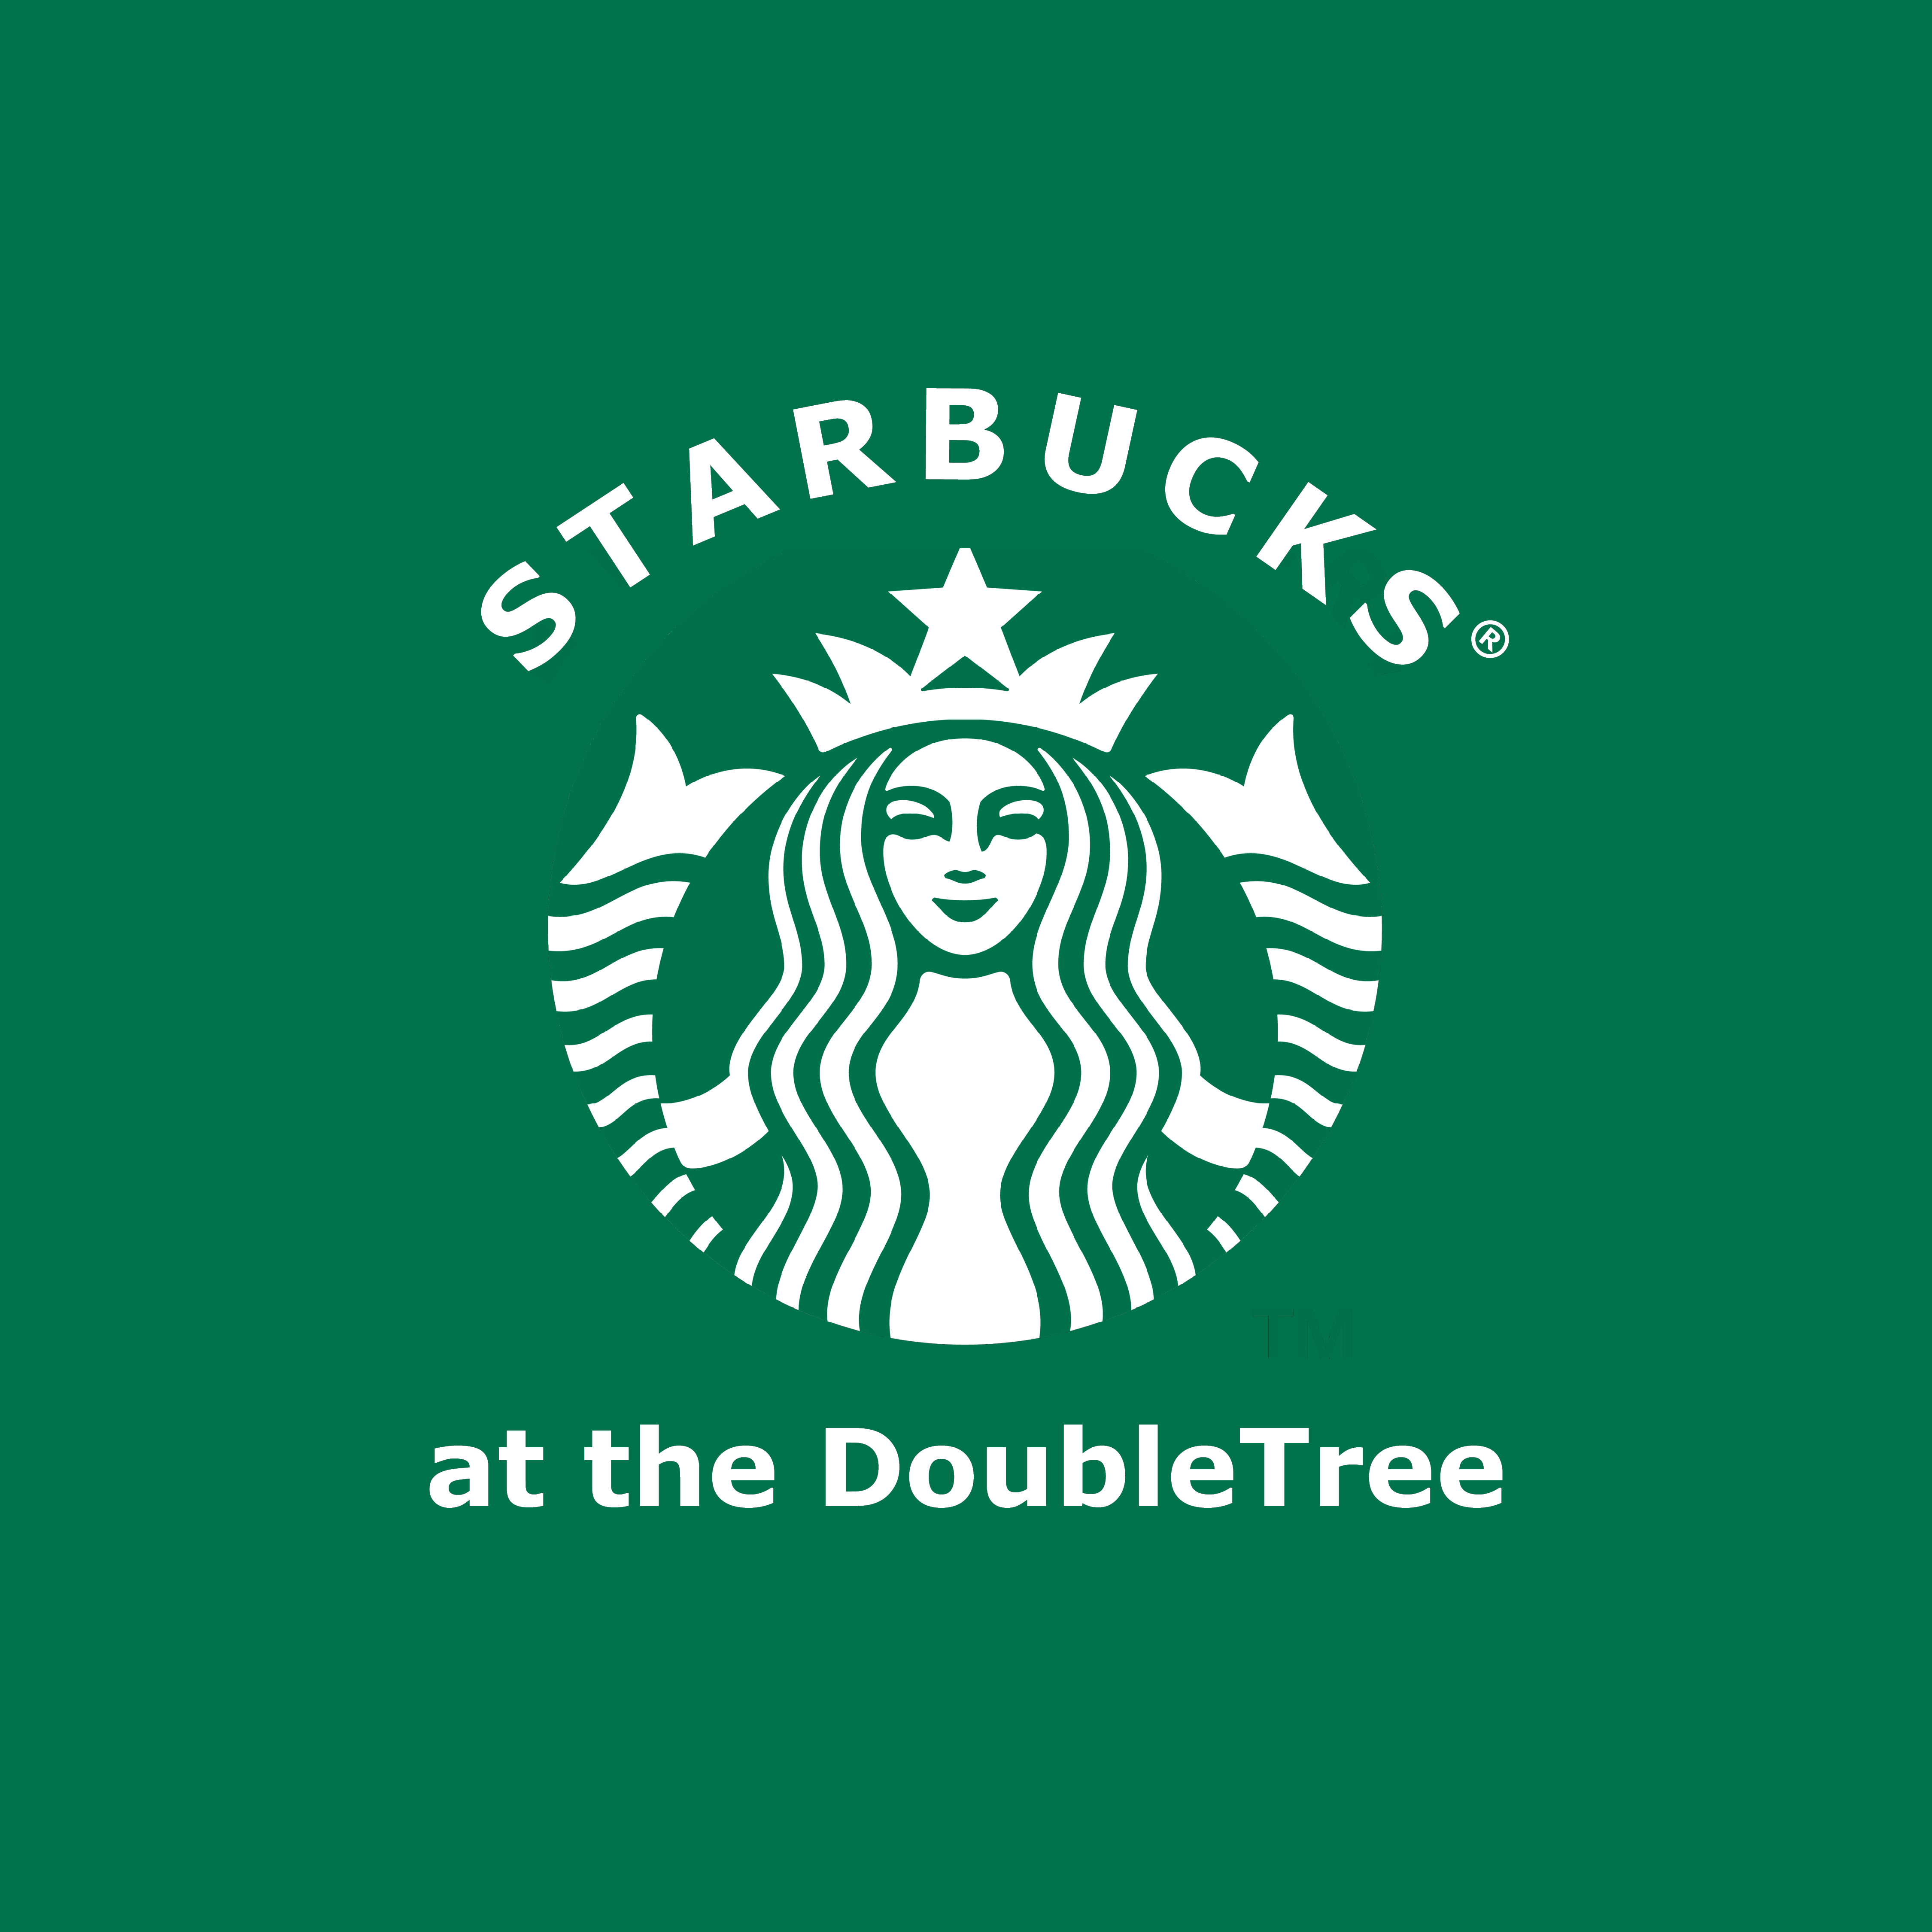 Starbucks at the DoubleTree Logo